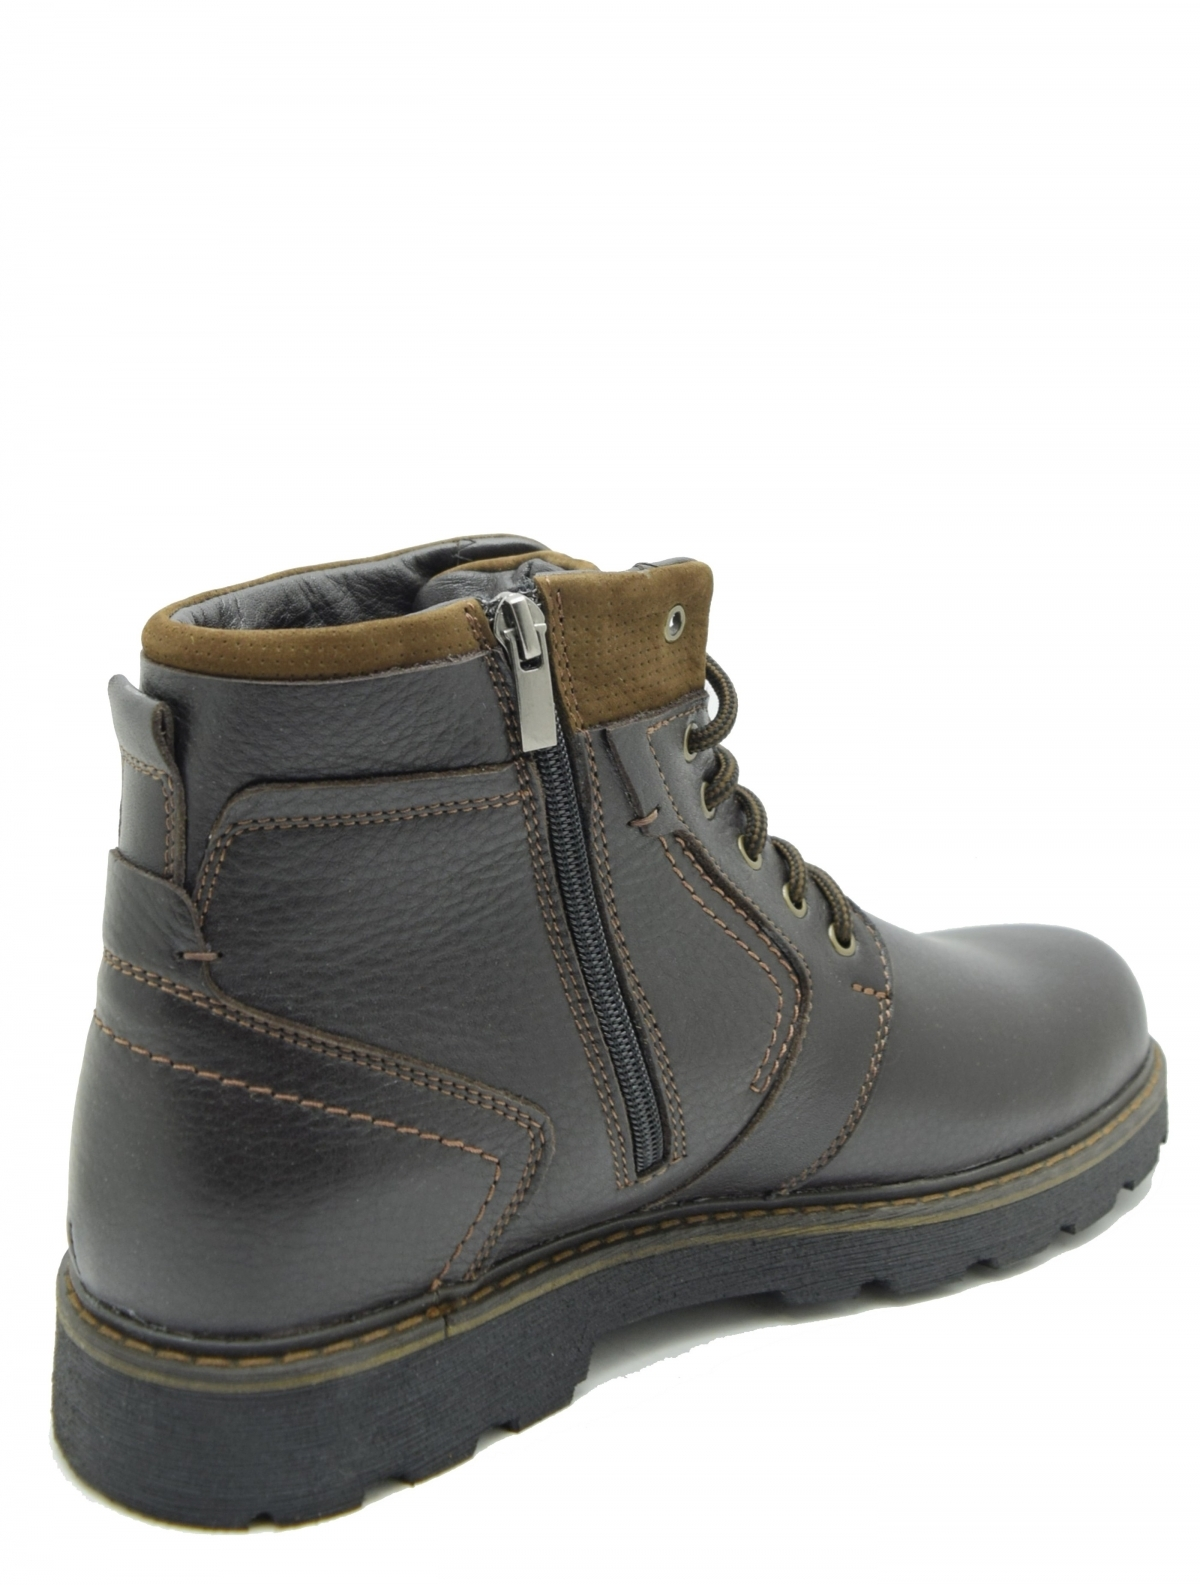 Baratto 1-805-304-2 мужские ботинки